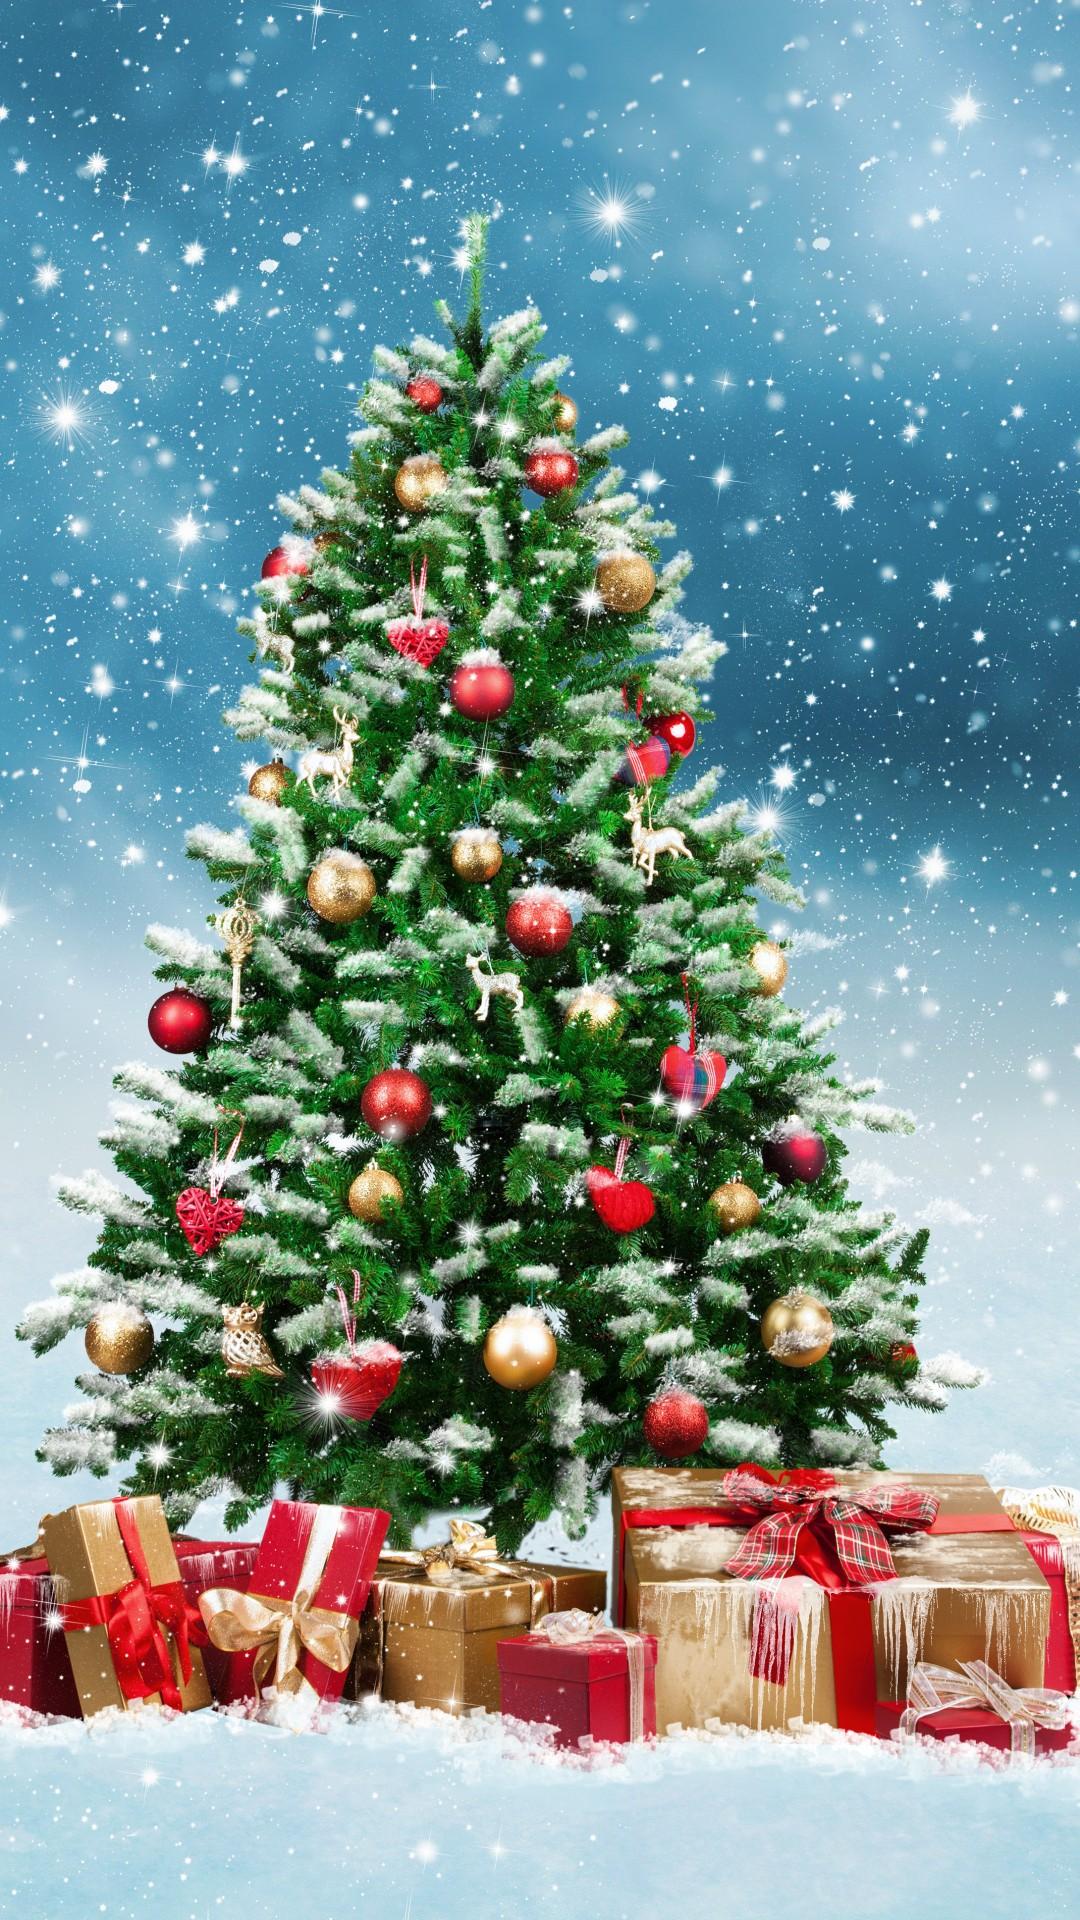 Wallpaper Christmas New Year Gifts Fir Tree Snow 5k